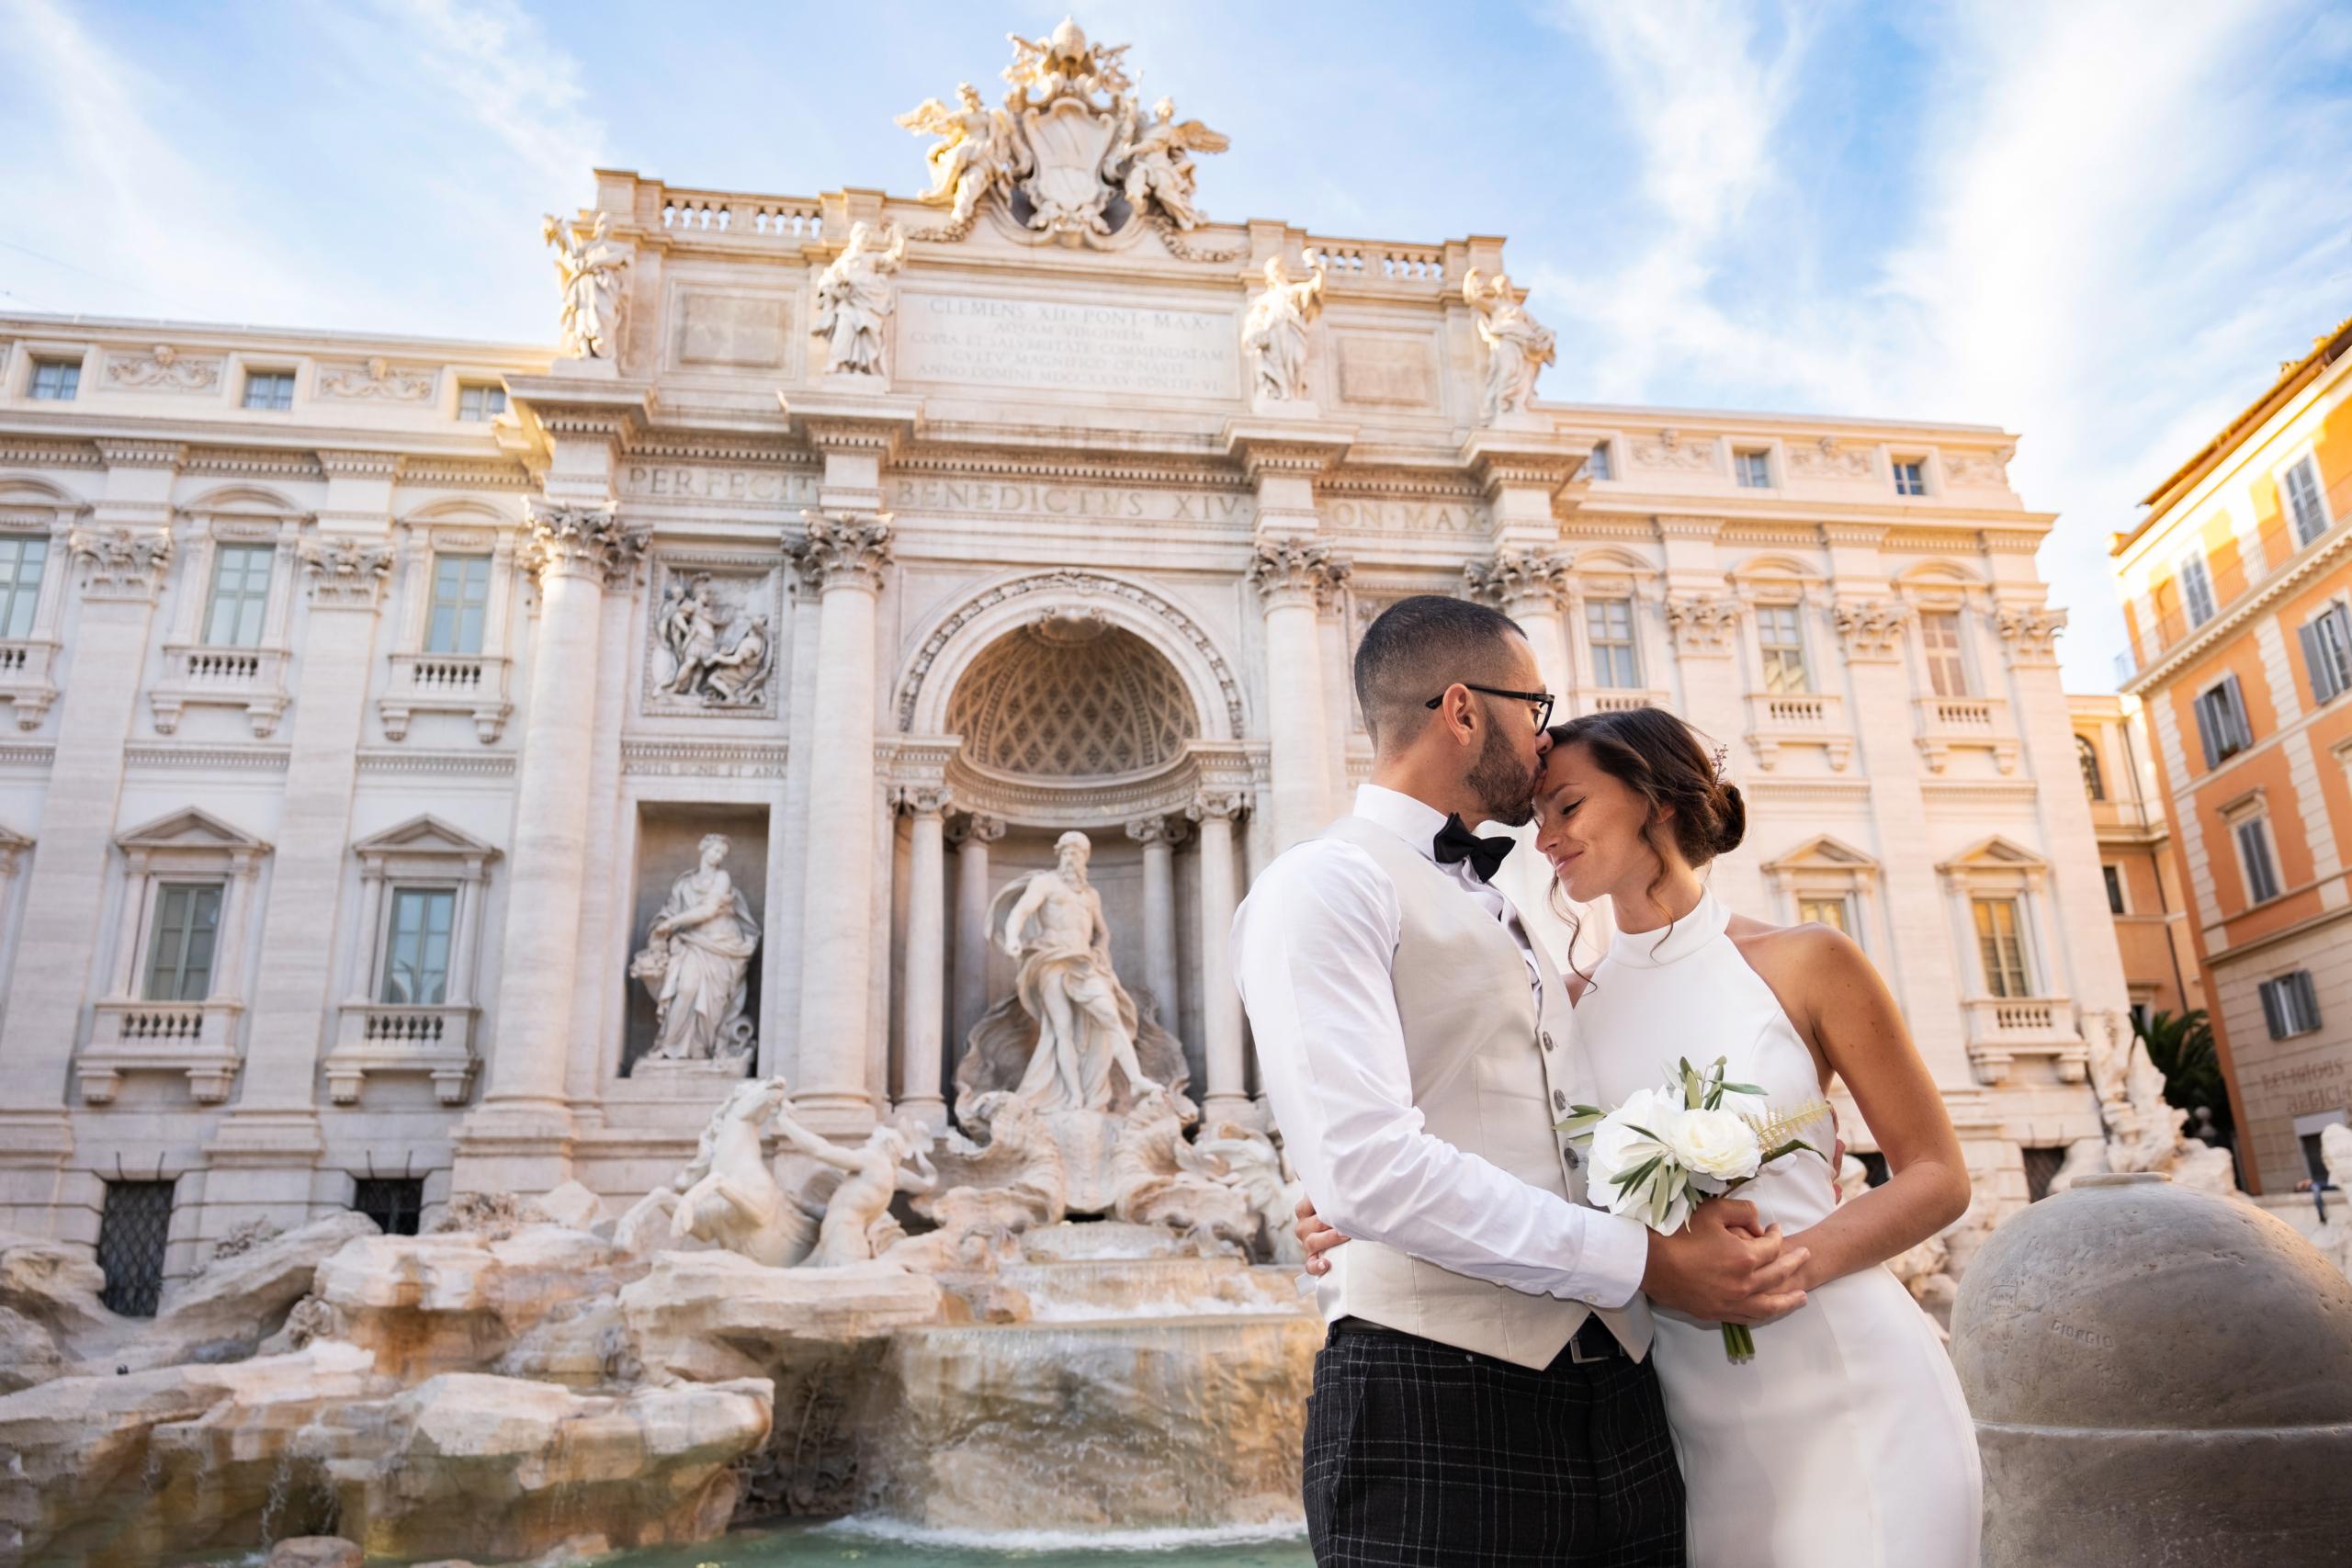 wedding, Rome, luxuriwedding, Elopewedding, Elopement, Tivoli, Bracciano, love, Friends, Cake, weddingcake, elopements: sposi unici protagonisti